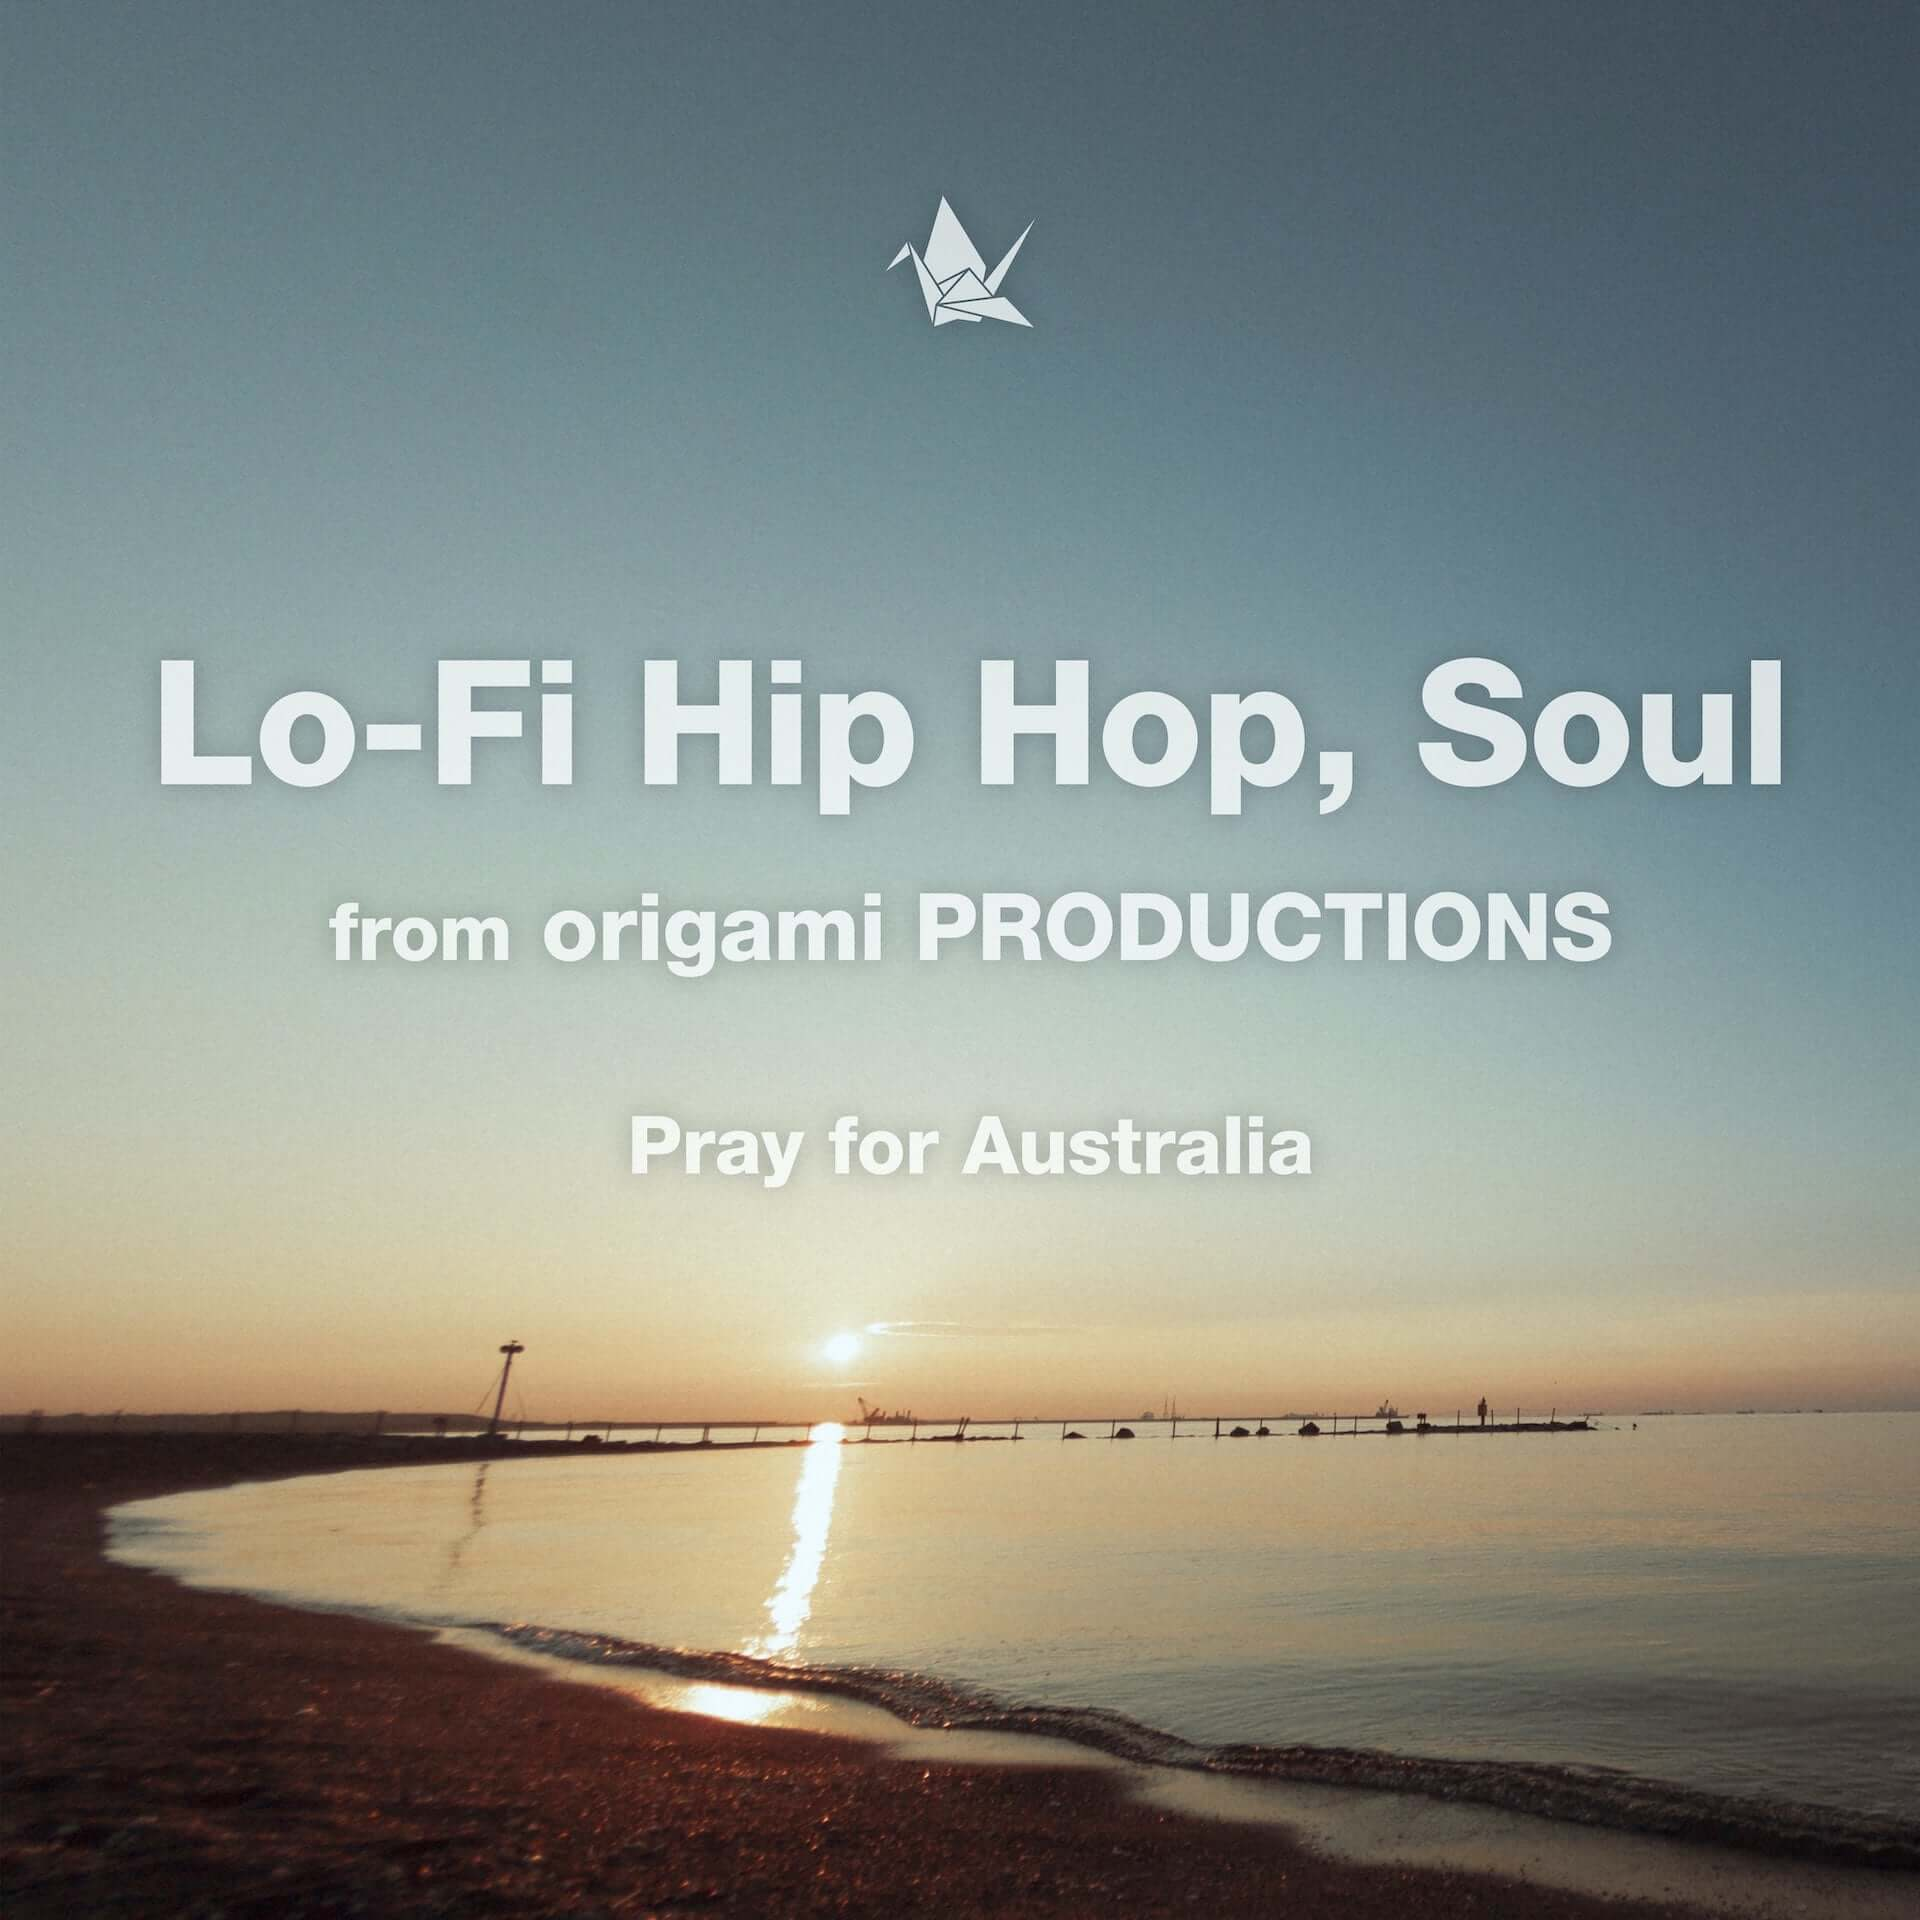 〈origami PRODUCTIONS〉からLo-Fi Hip Hop, Soulのコンピがリリース!mabanua、Shingo Suzuki、関口シンゴ、Kan Sano、Ovallらが参加 music200324_origami_productions_1-1920x1920